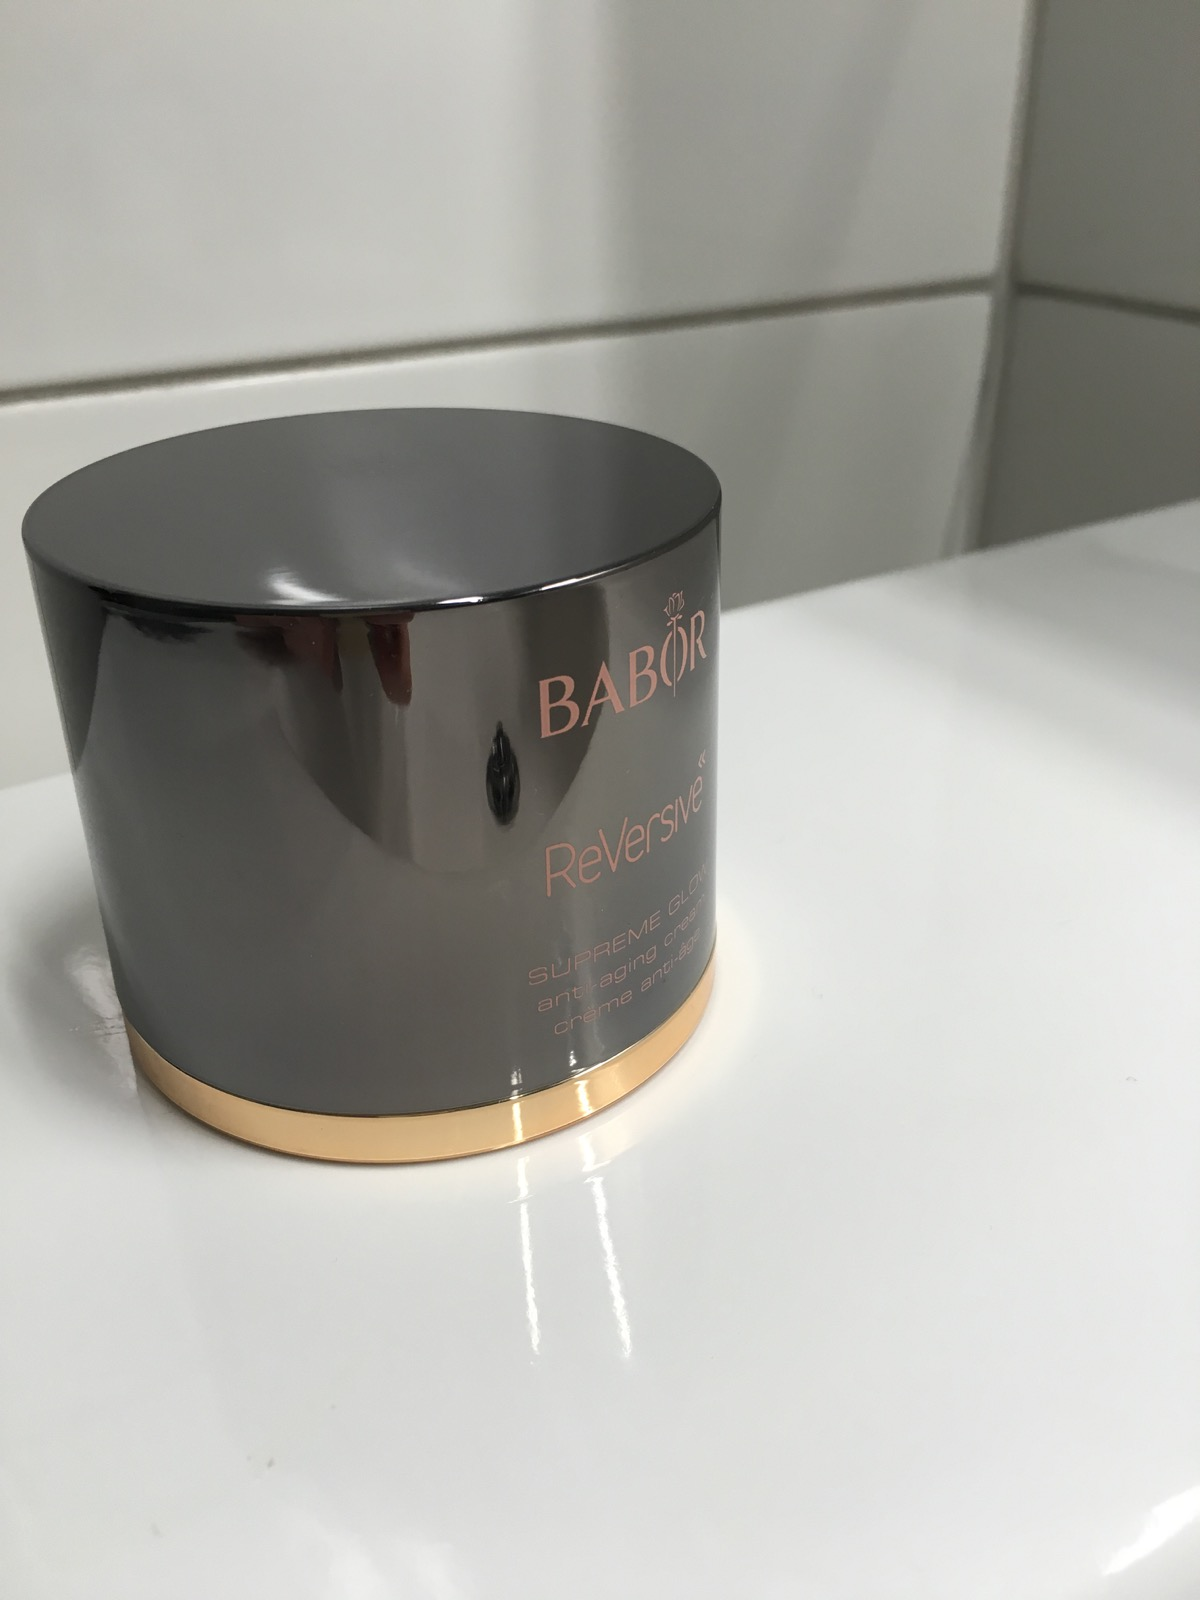 babor reversive glow cream jar|skonhetssnack.se